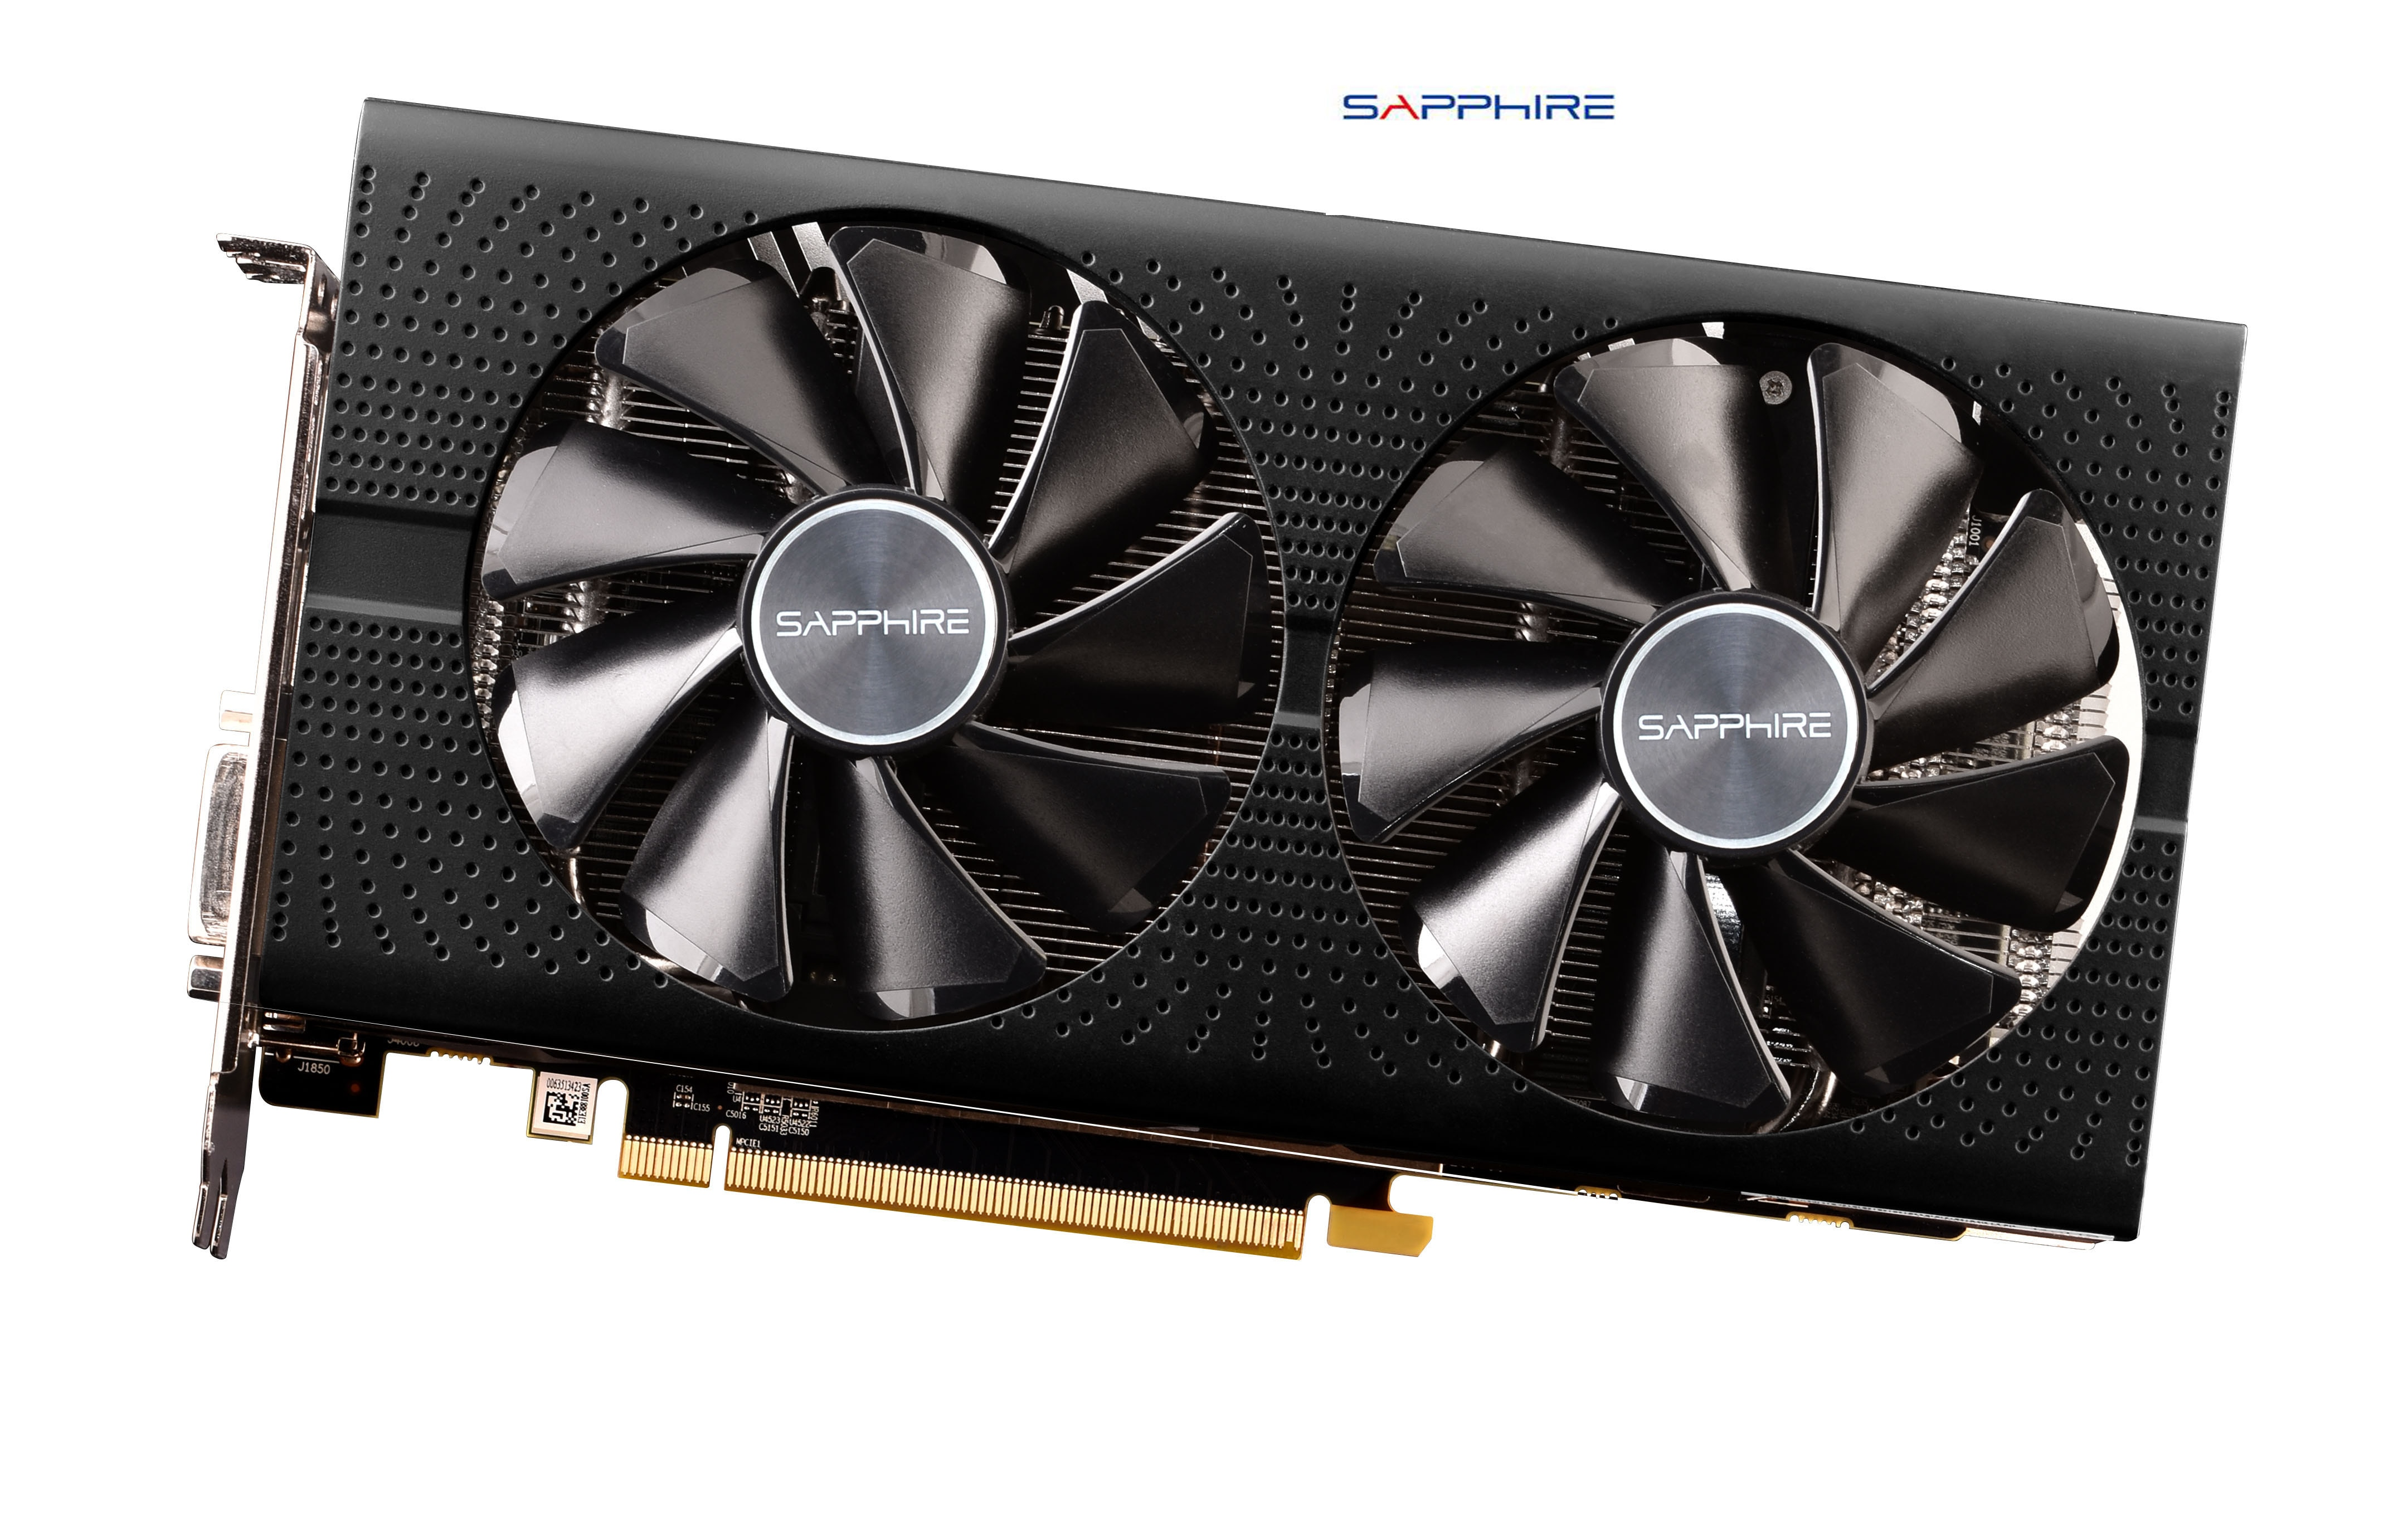 Used,SAPPHIRE Video Card RX 580 4GB 256Bit GDDR5 Graphics Cards DisplayPort DVI (2048 stream processor)